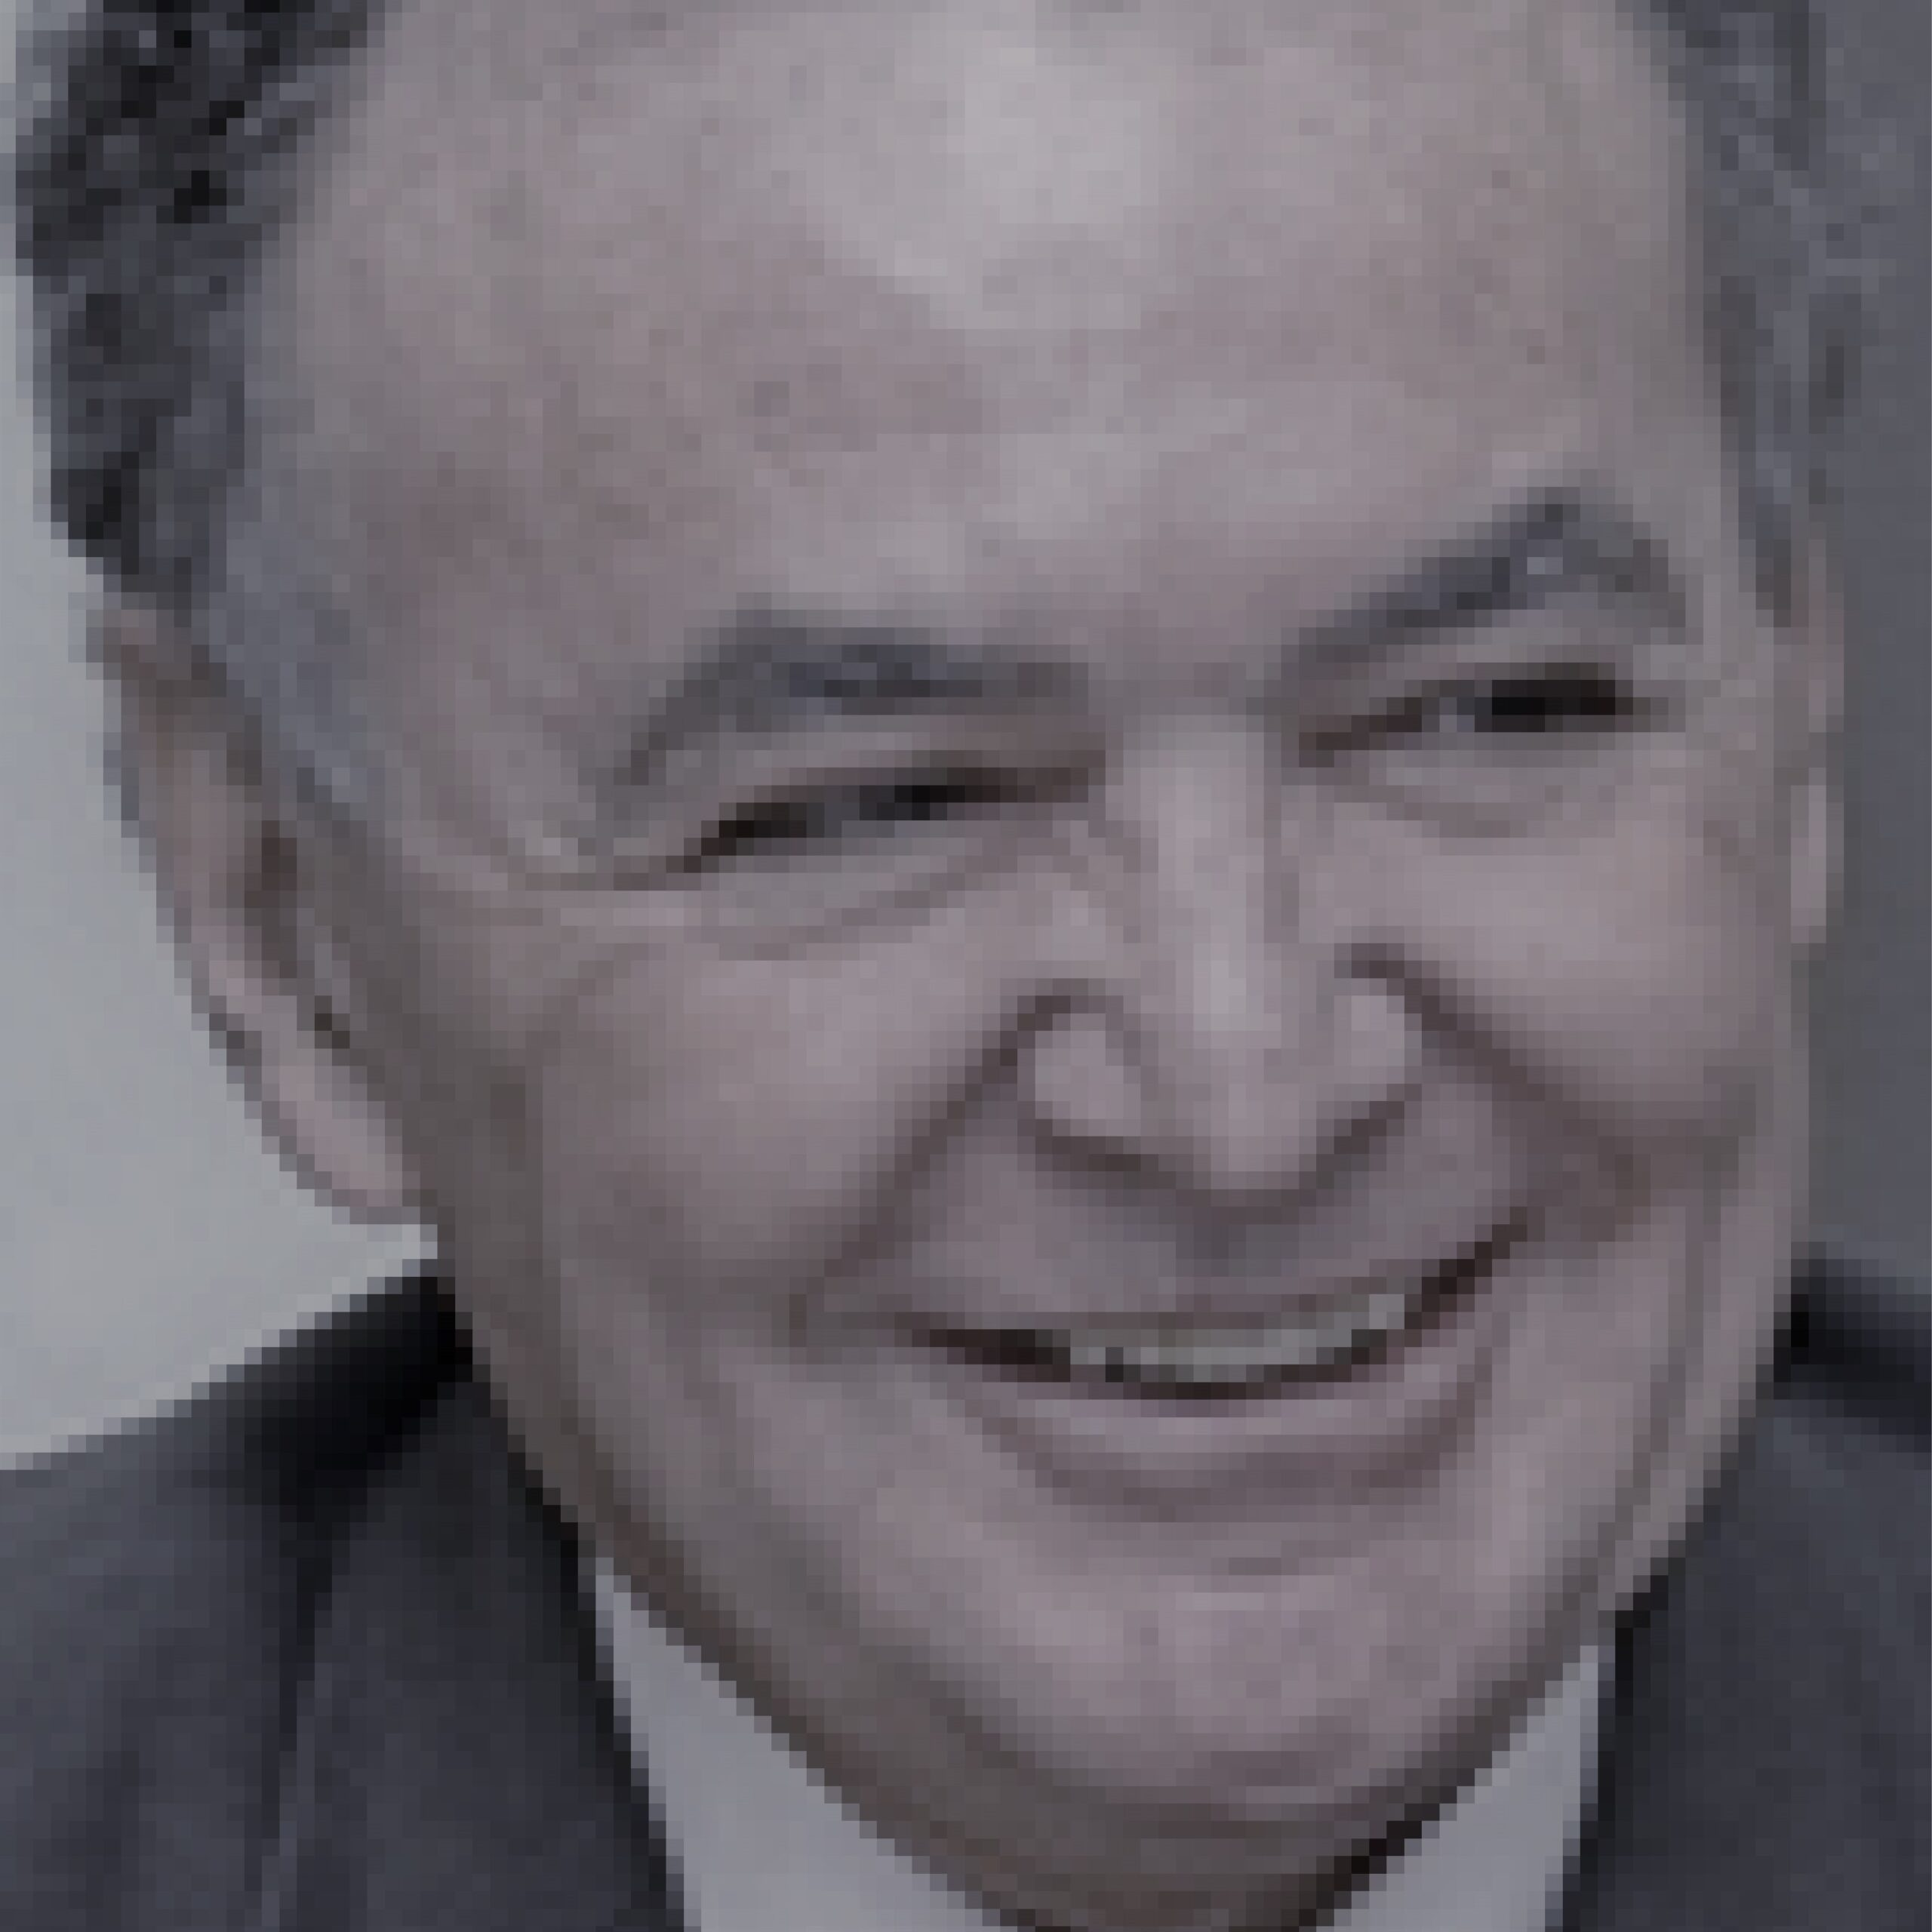 Dott. Luigi Bobba